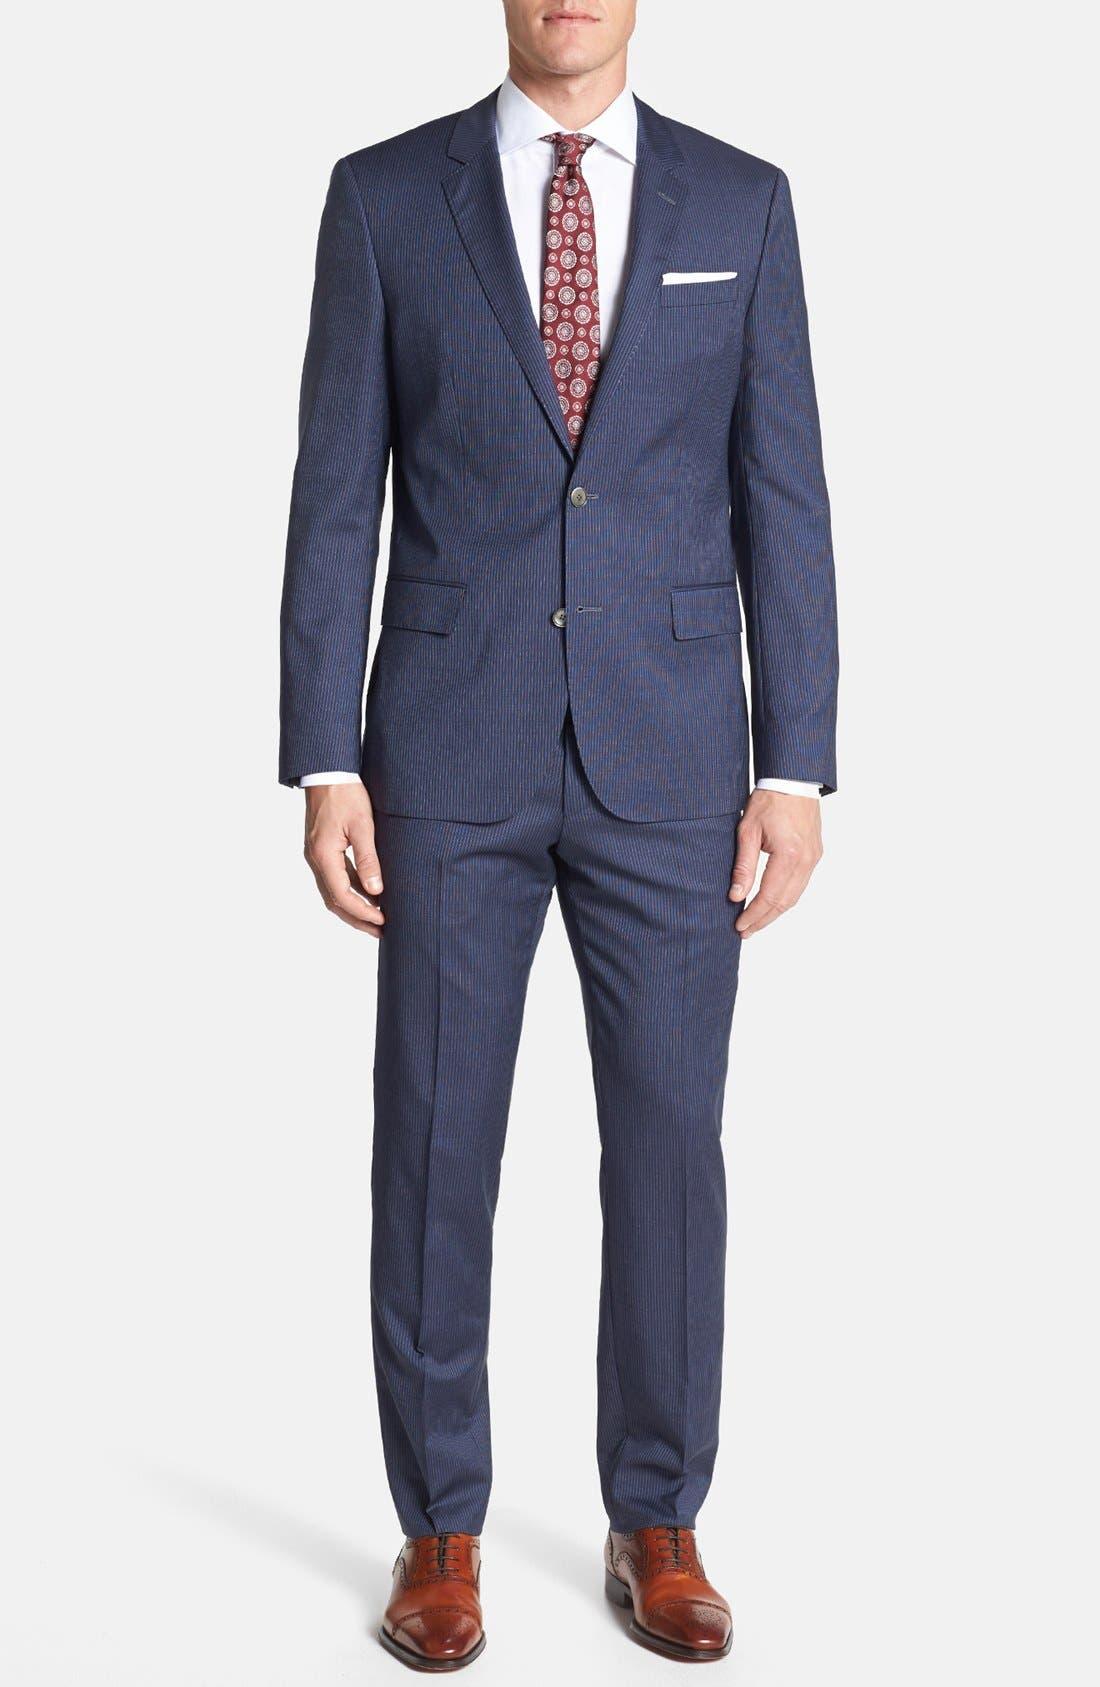 Alternate Image 1 Selected - BOSS HUGO BOSS 'Hutson/Gander' Trim Fit Stripe Suit